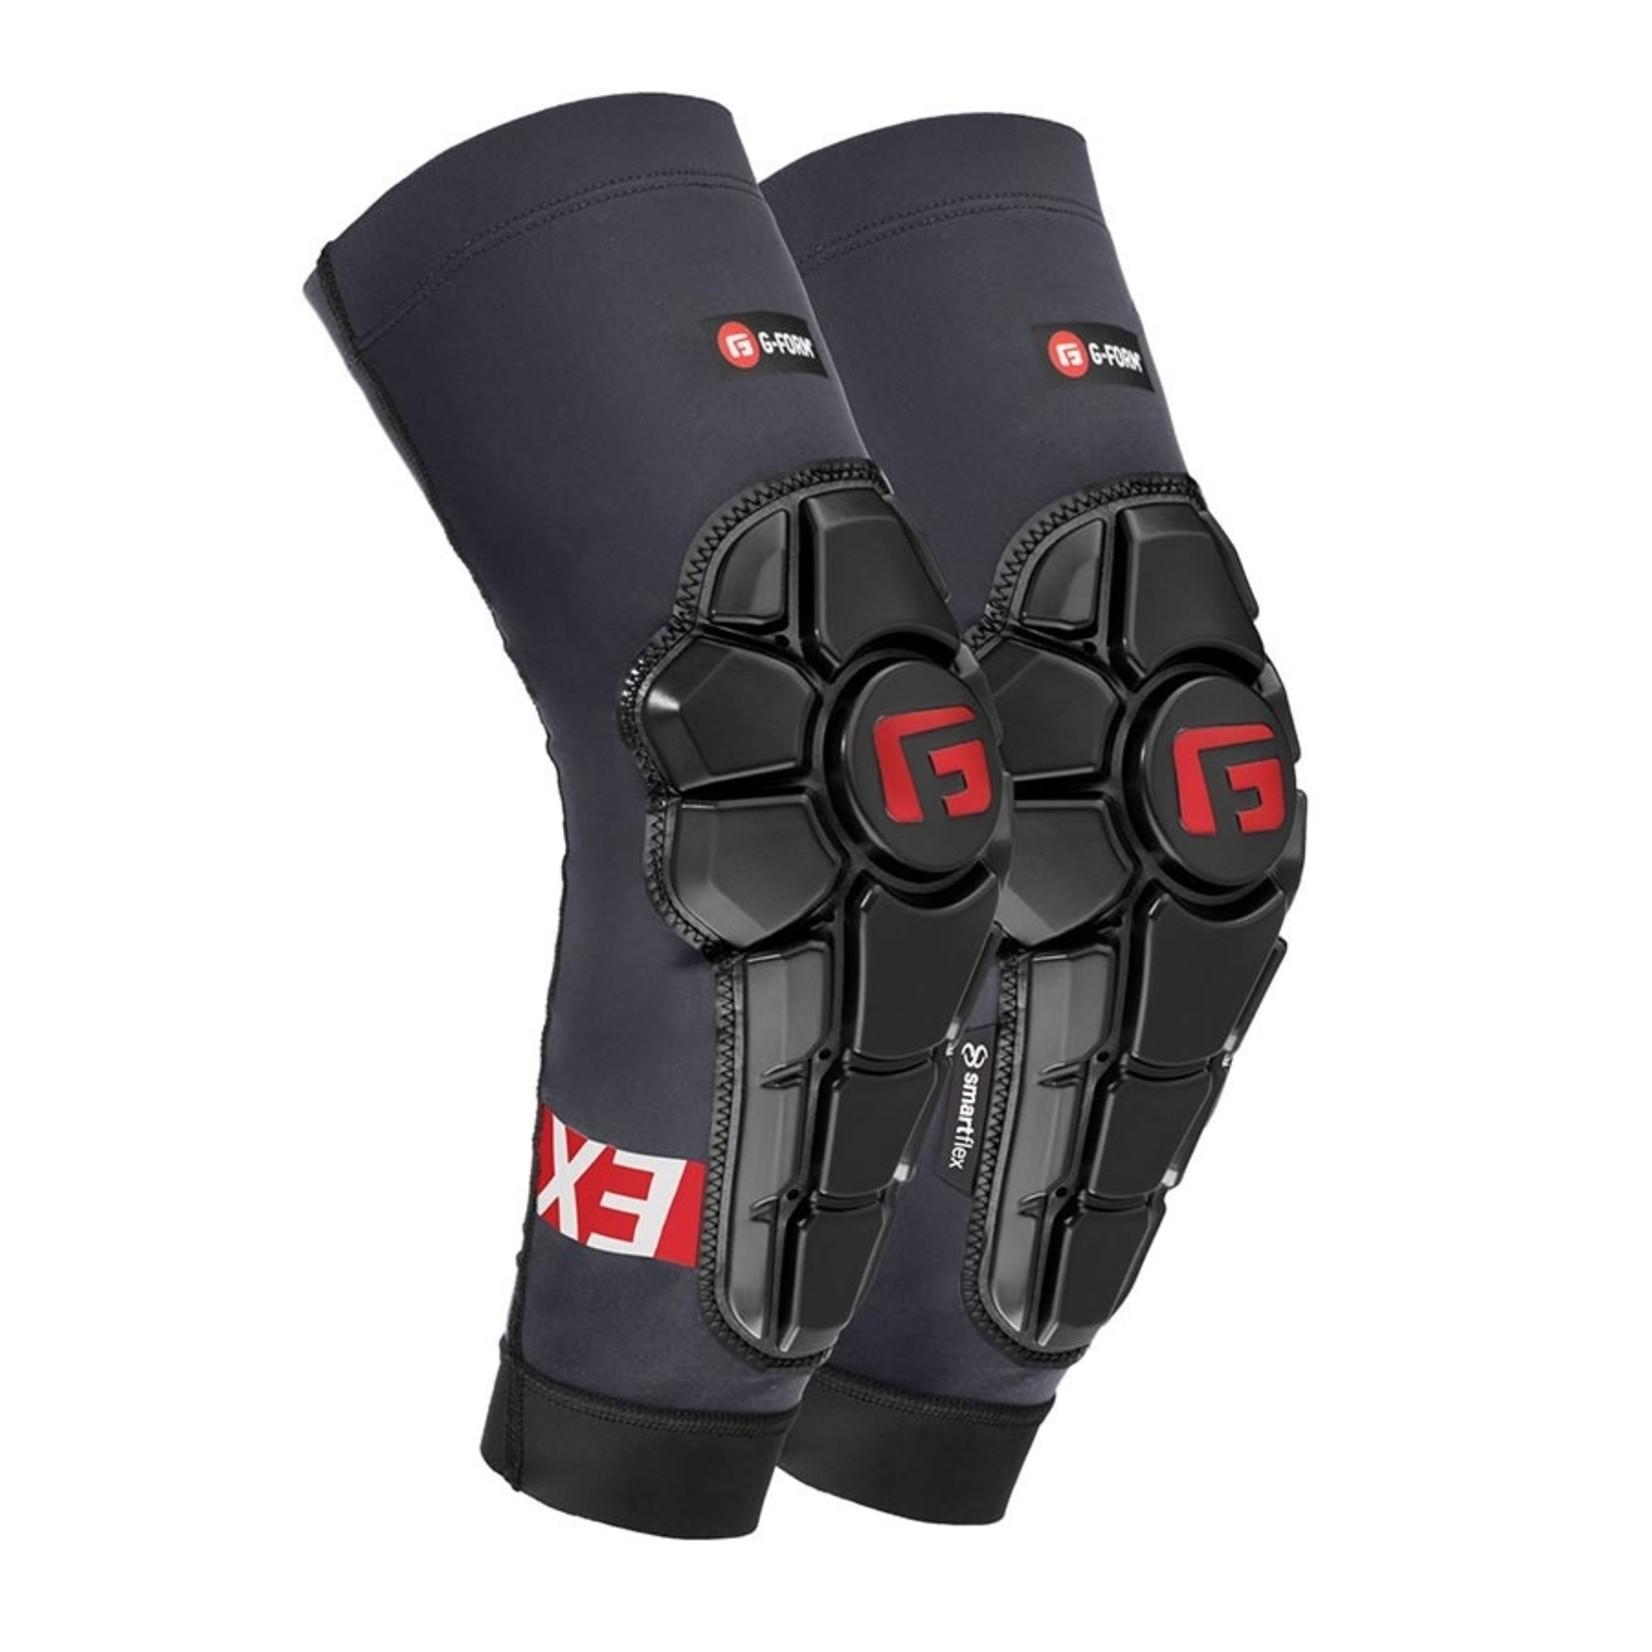 G-Form G-Form, Pro-X3, Elbow/Forearm Guard, Black, XL, Pair